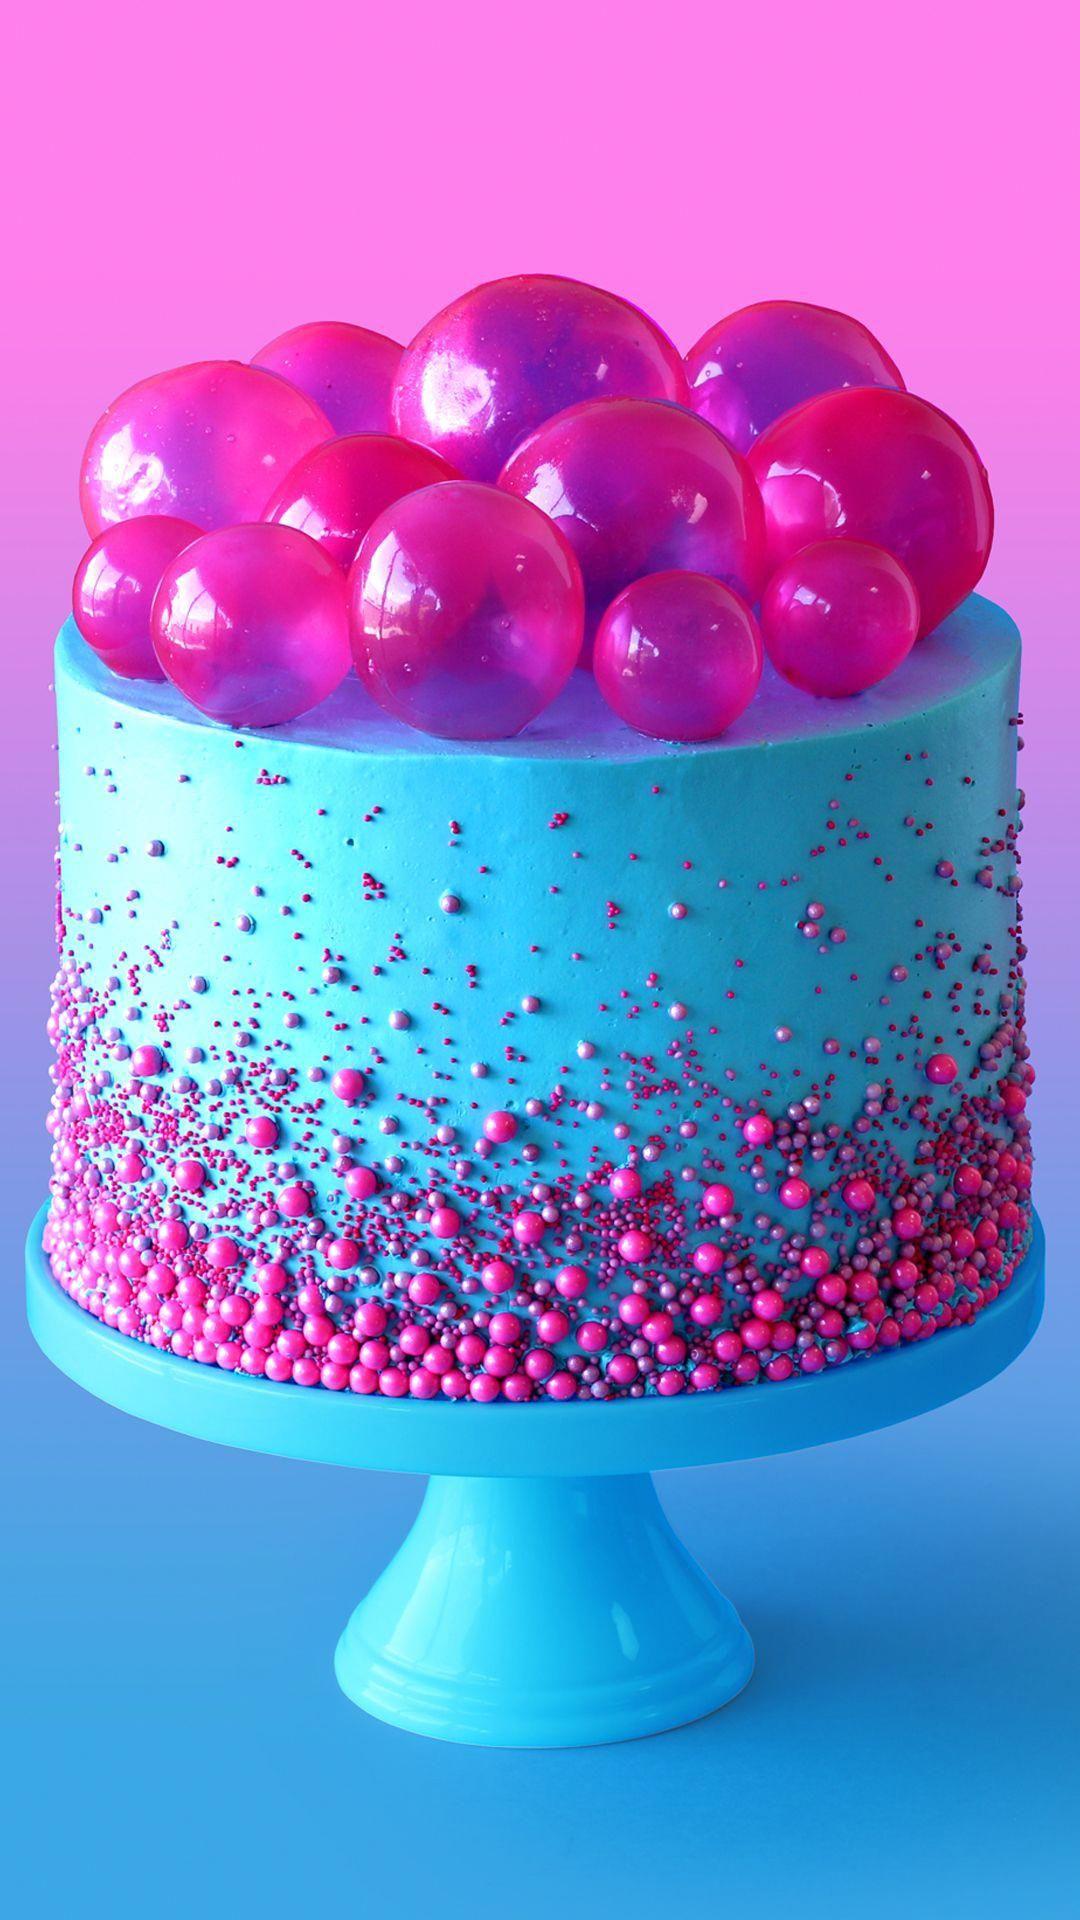 Bubble pop electric cake recipe in 2020 bubble cake